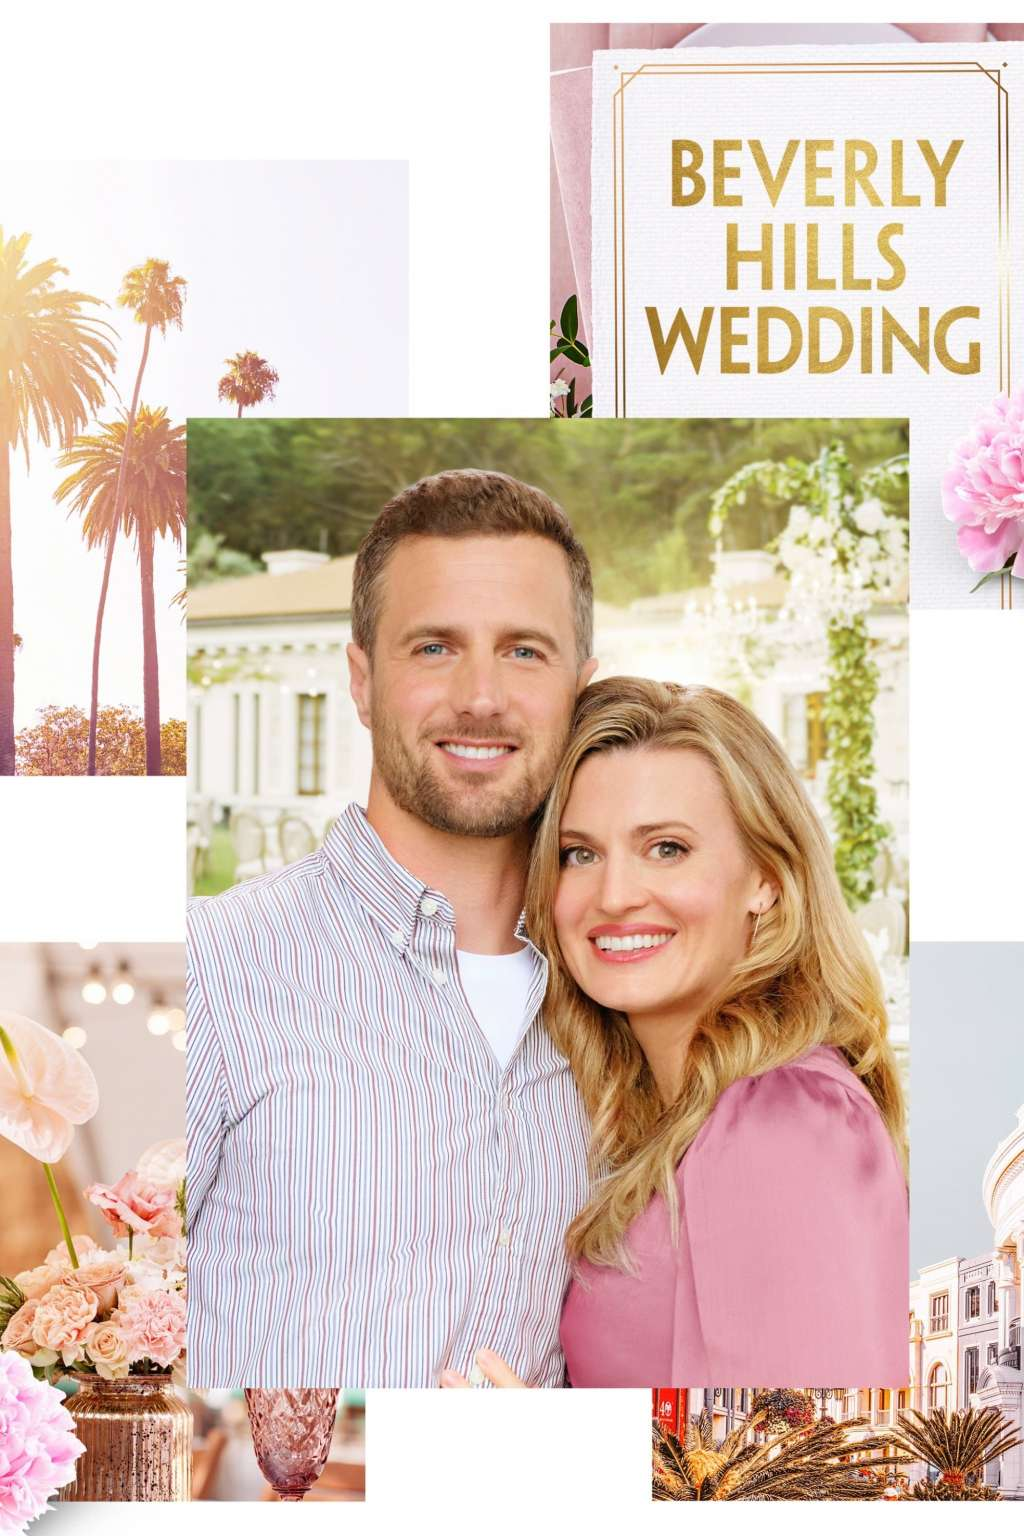 Beverly Hills Wedding kapak